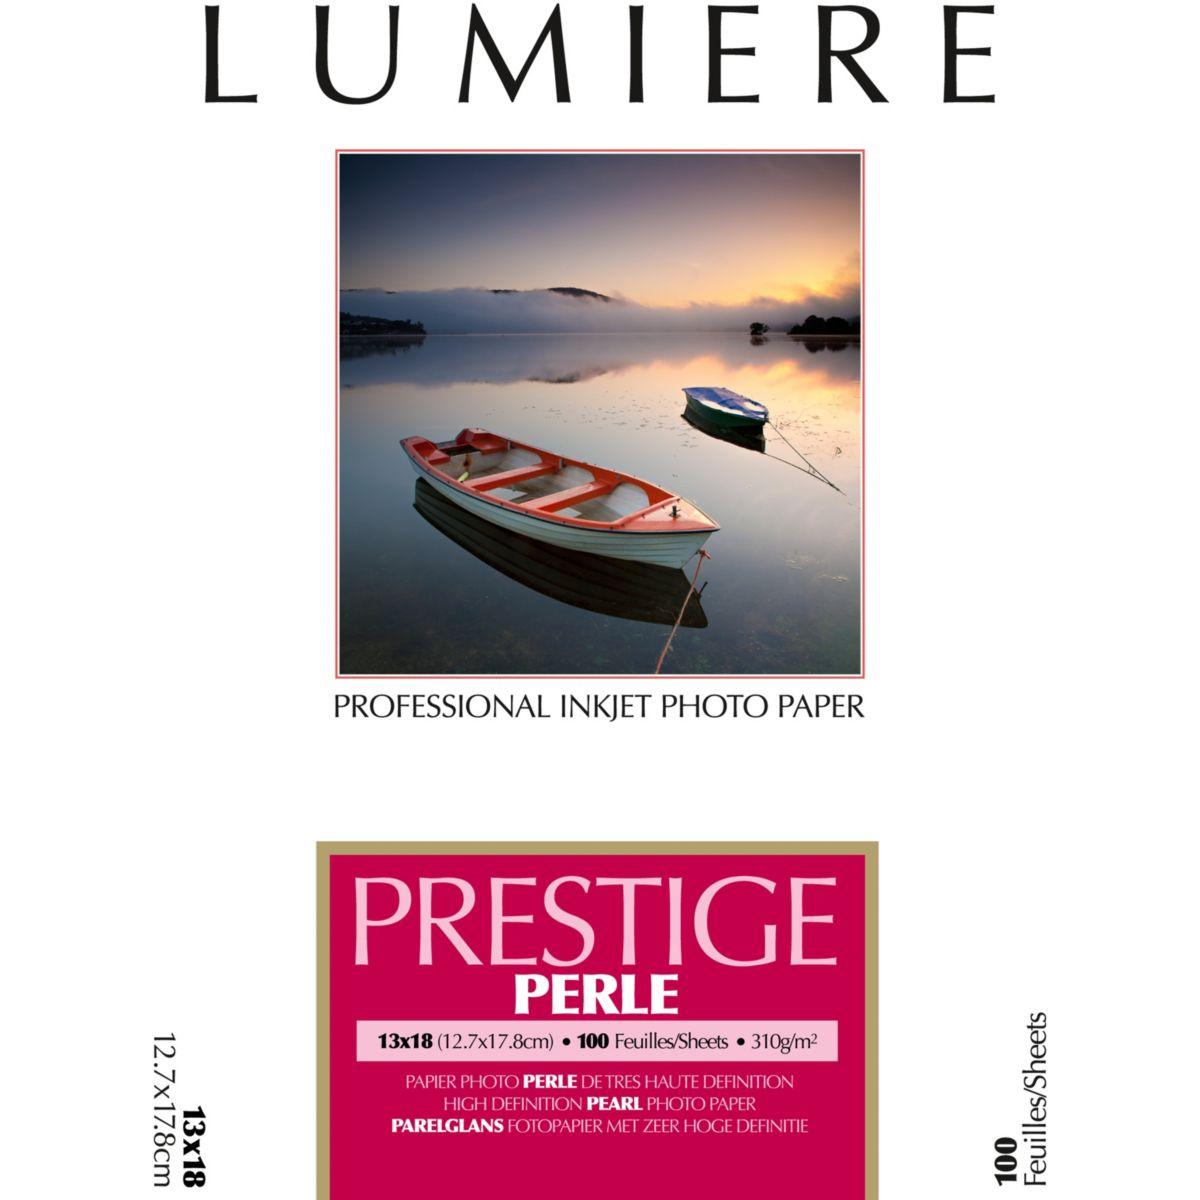 Papier photo LUMIERE Prestige Perle 100f 12,7x17,8 310g